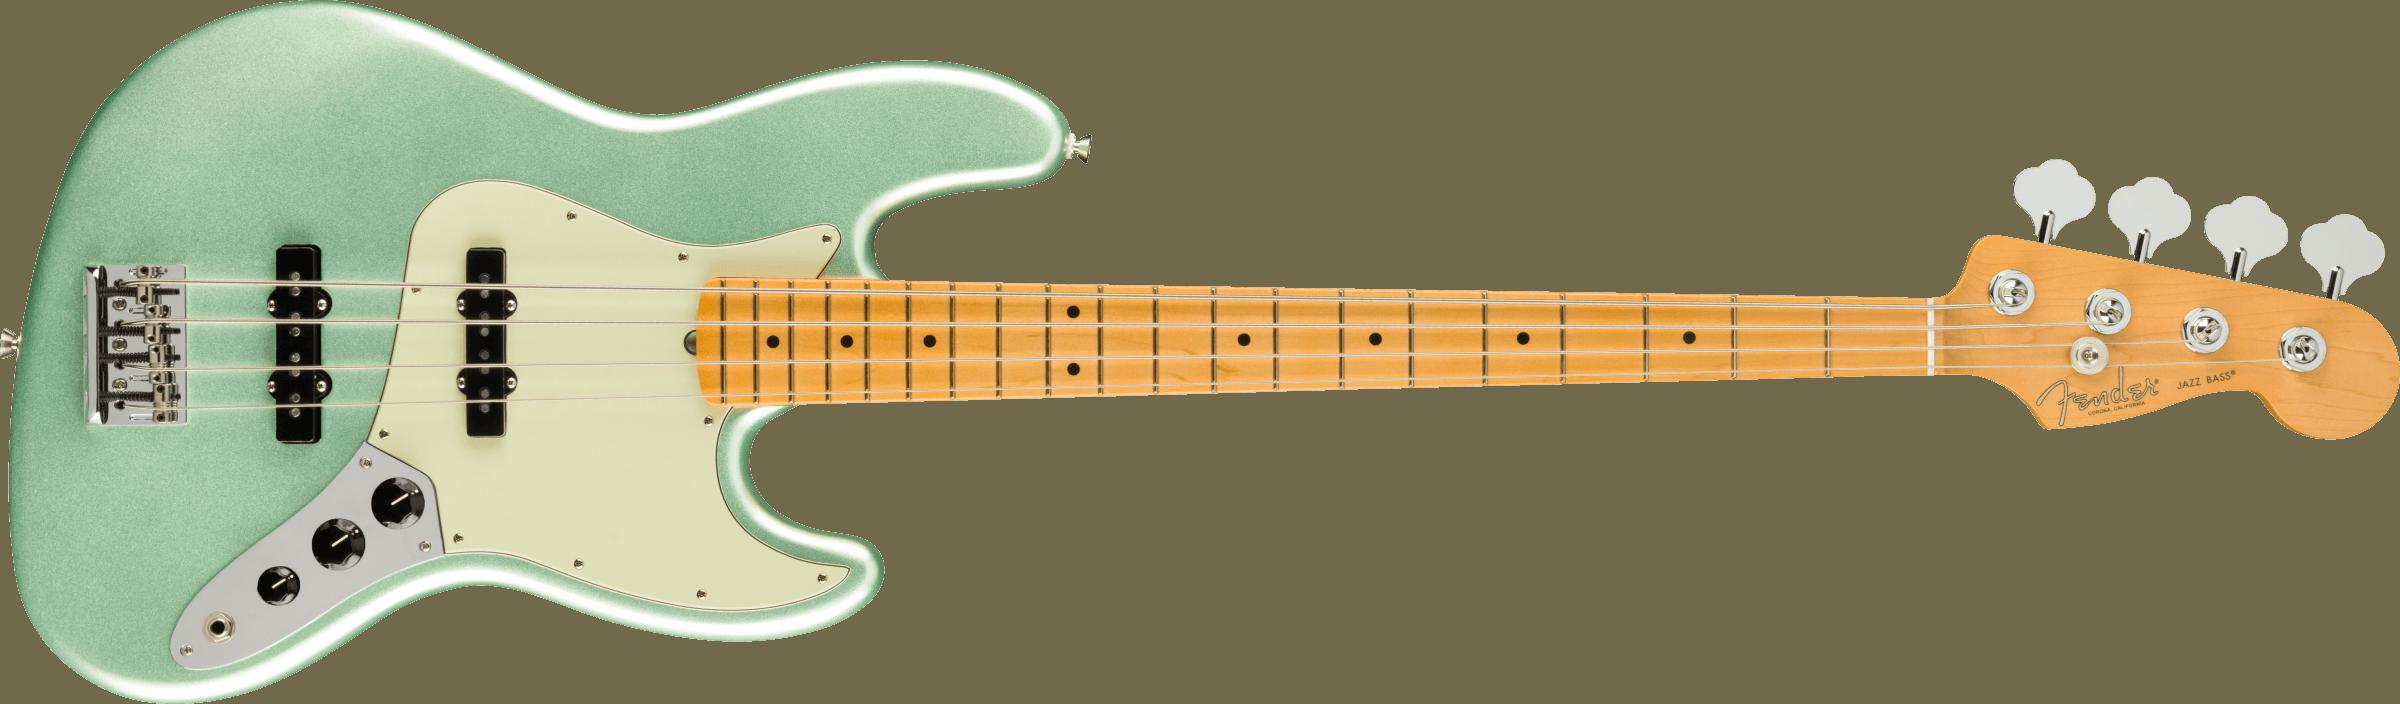 FENDER-American-Professional-II-Jazz-Bass-Maple-Fingerboard-Mystic-Surf-Green-sku-571005480